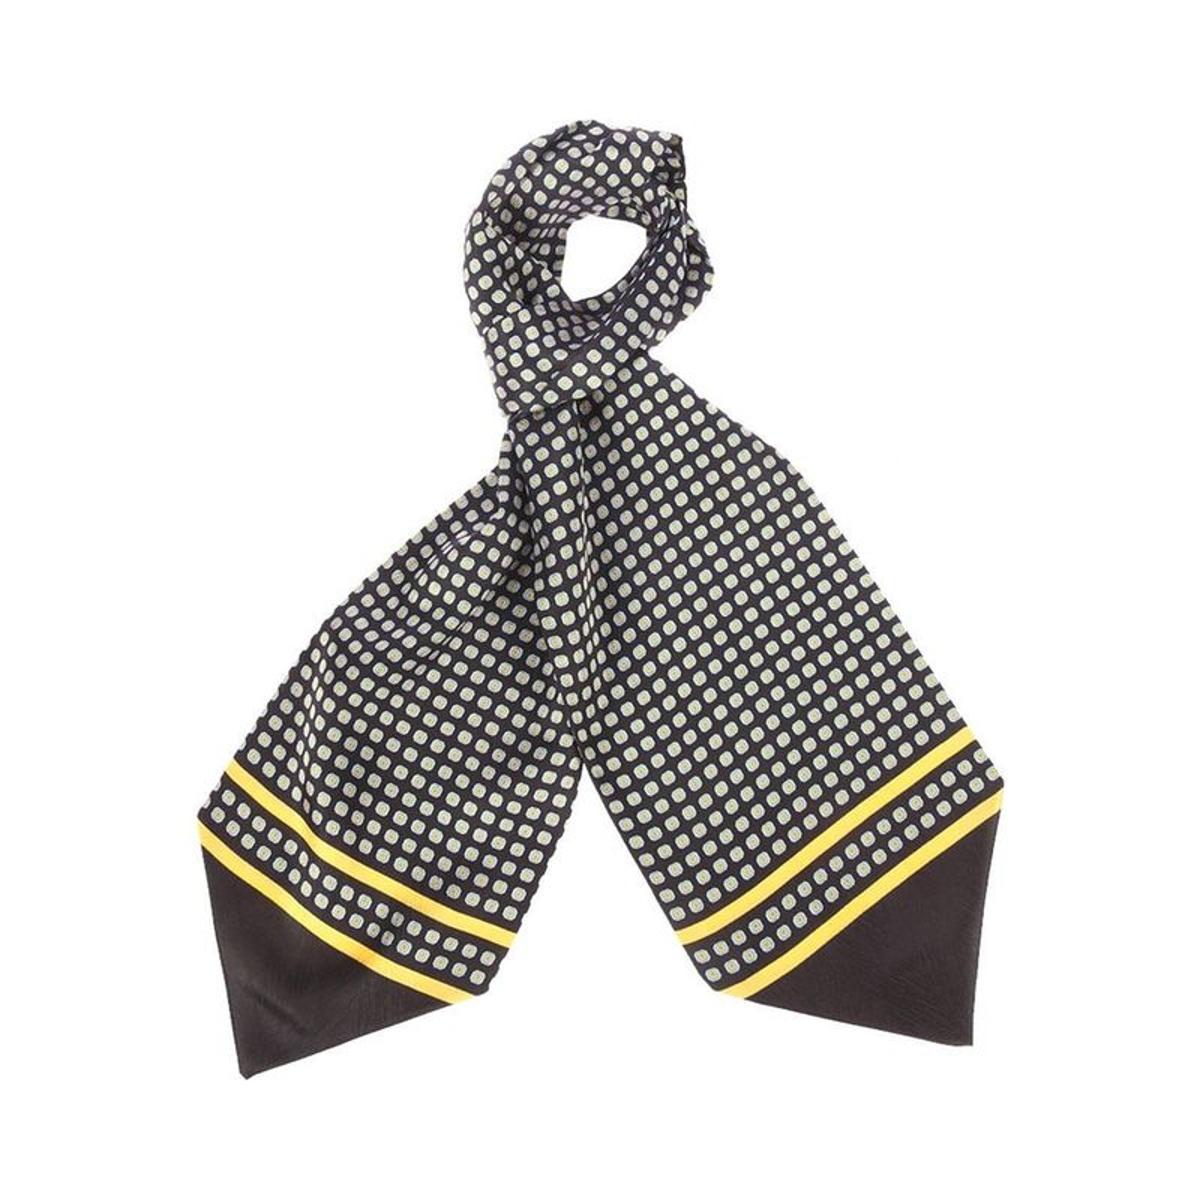 Touche Finale - echarpes, chèches, foulards